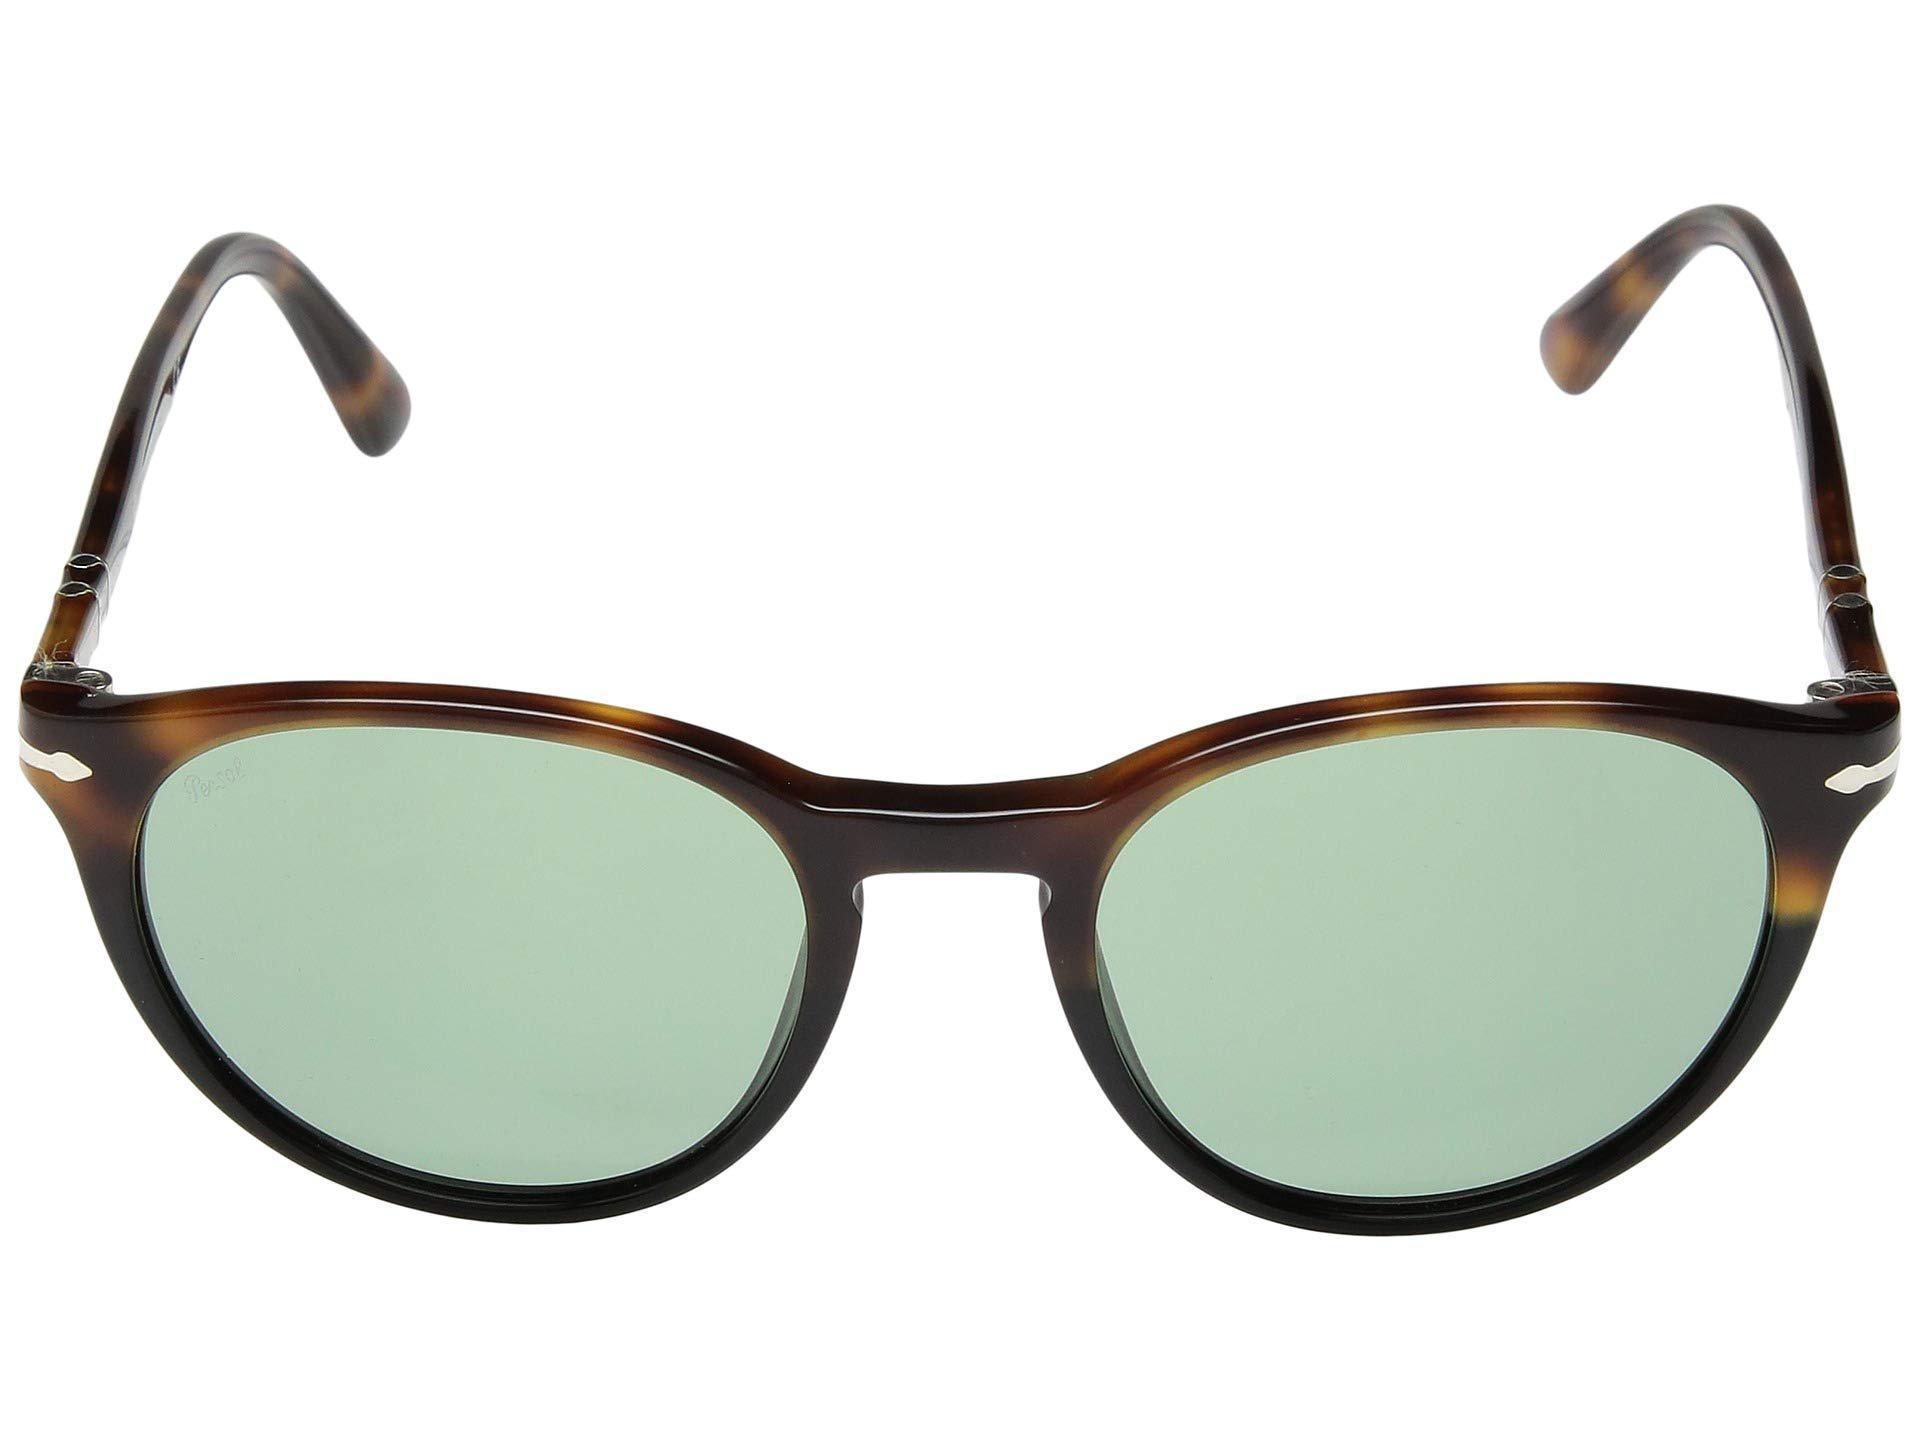 679339d911 Lyst - Persol 0po3152s (tortoise Black grey) Fashion Sunglasses for Men